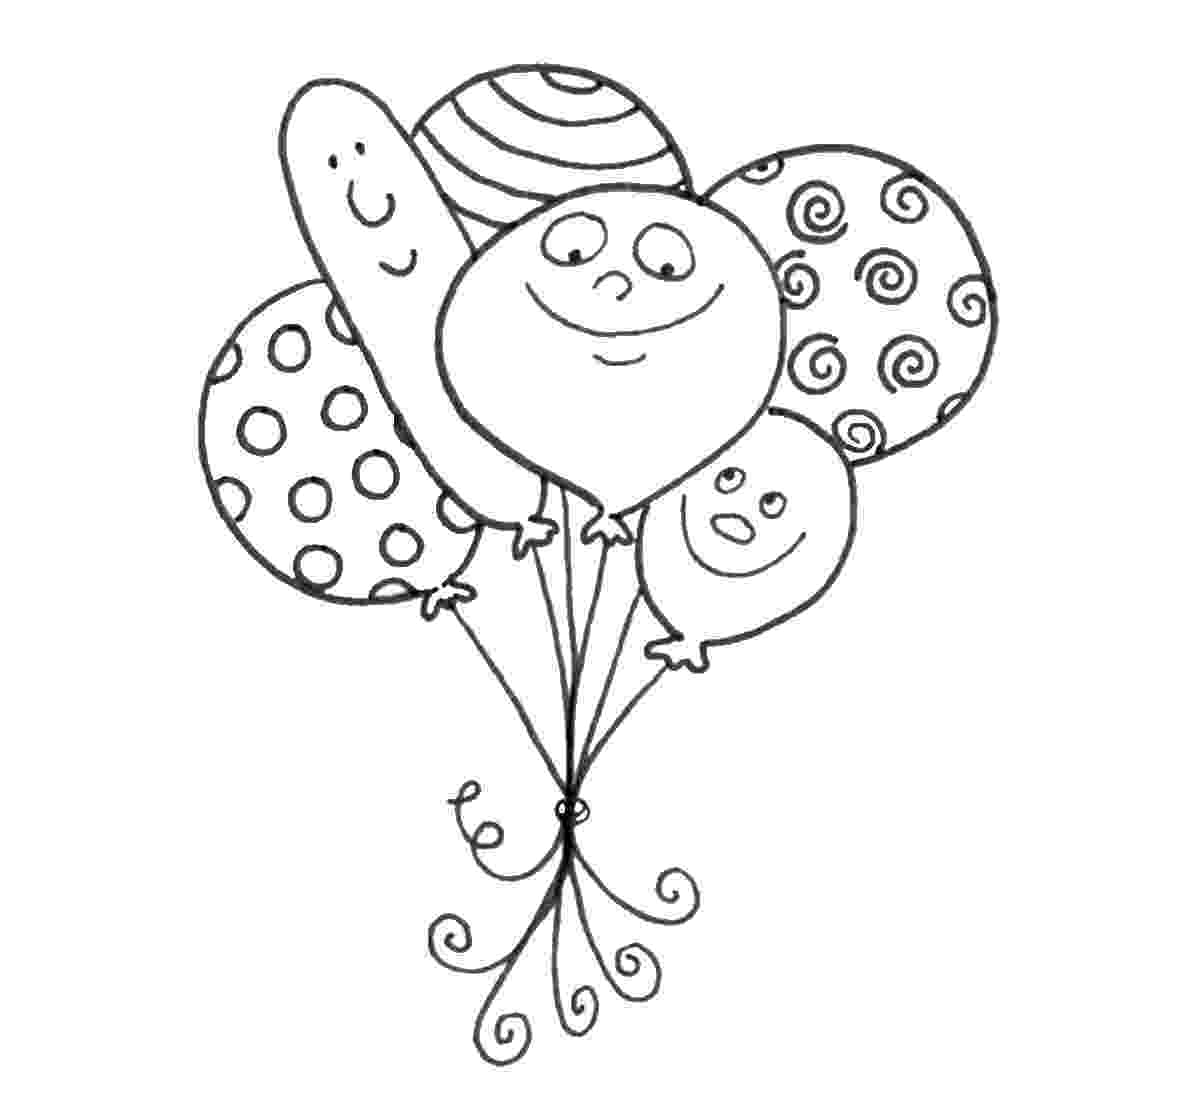 balloon coloring page balloon coloring pages for kids to print for free page balloon coloring